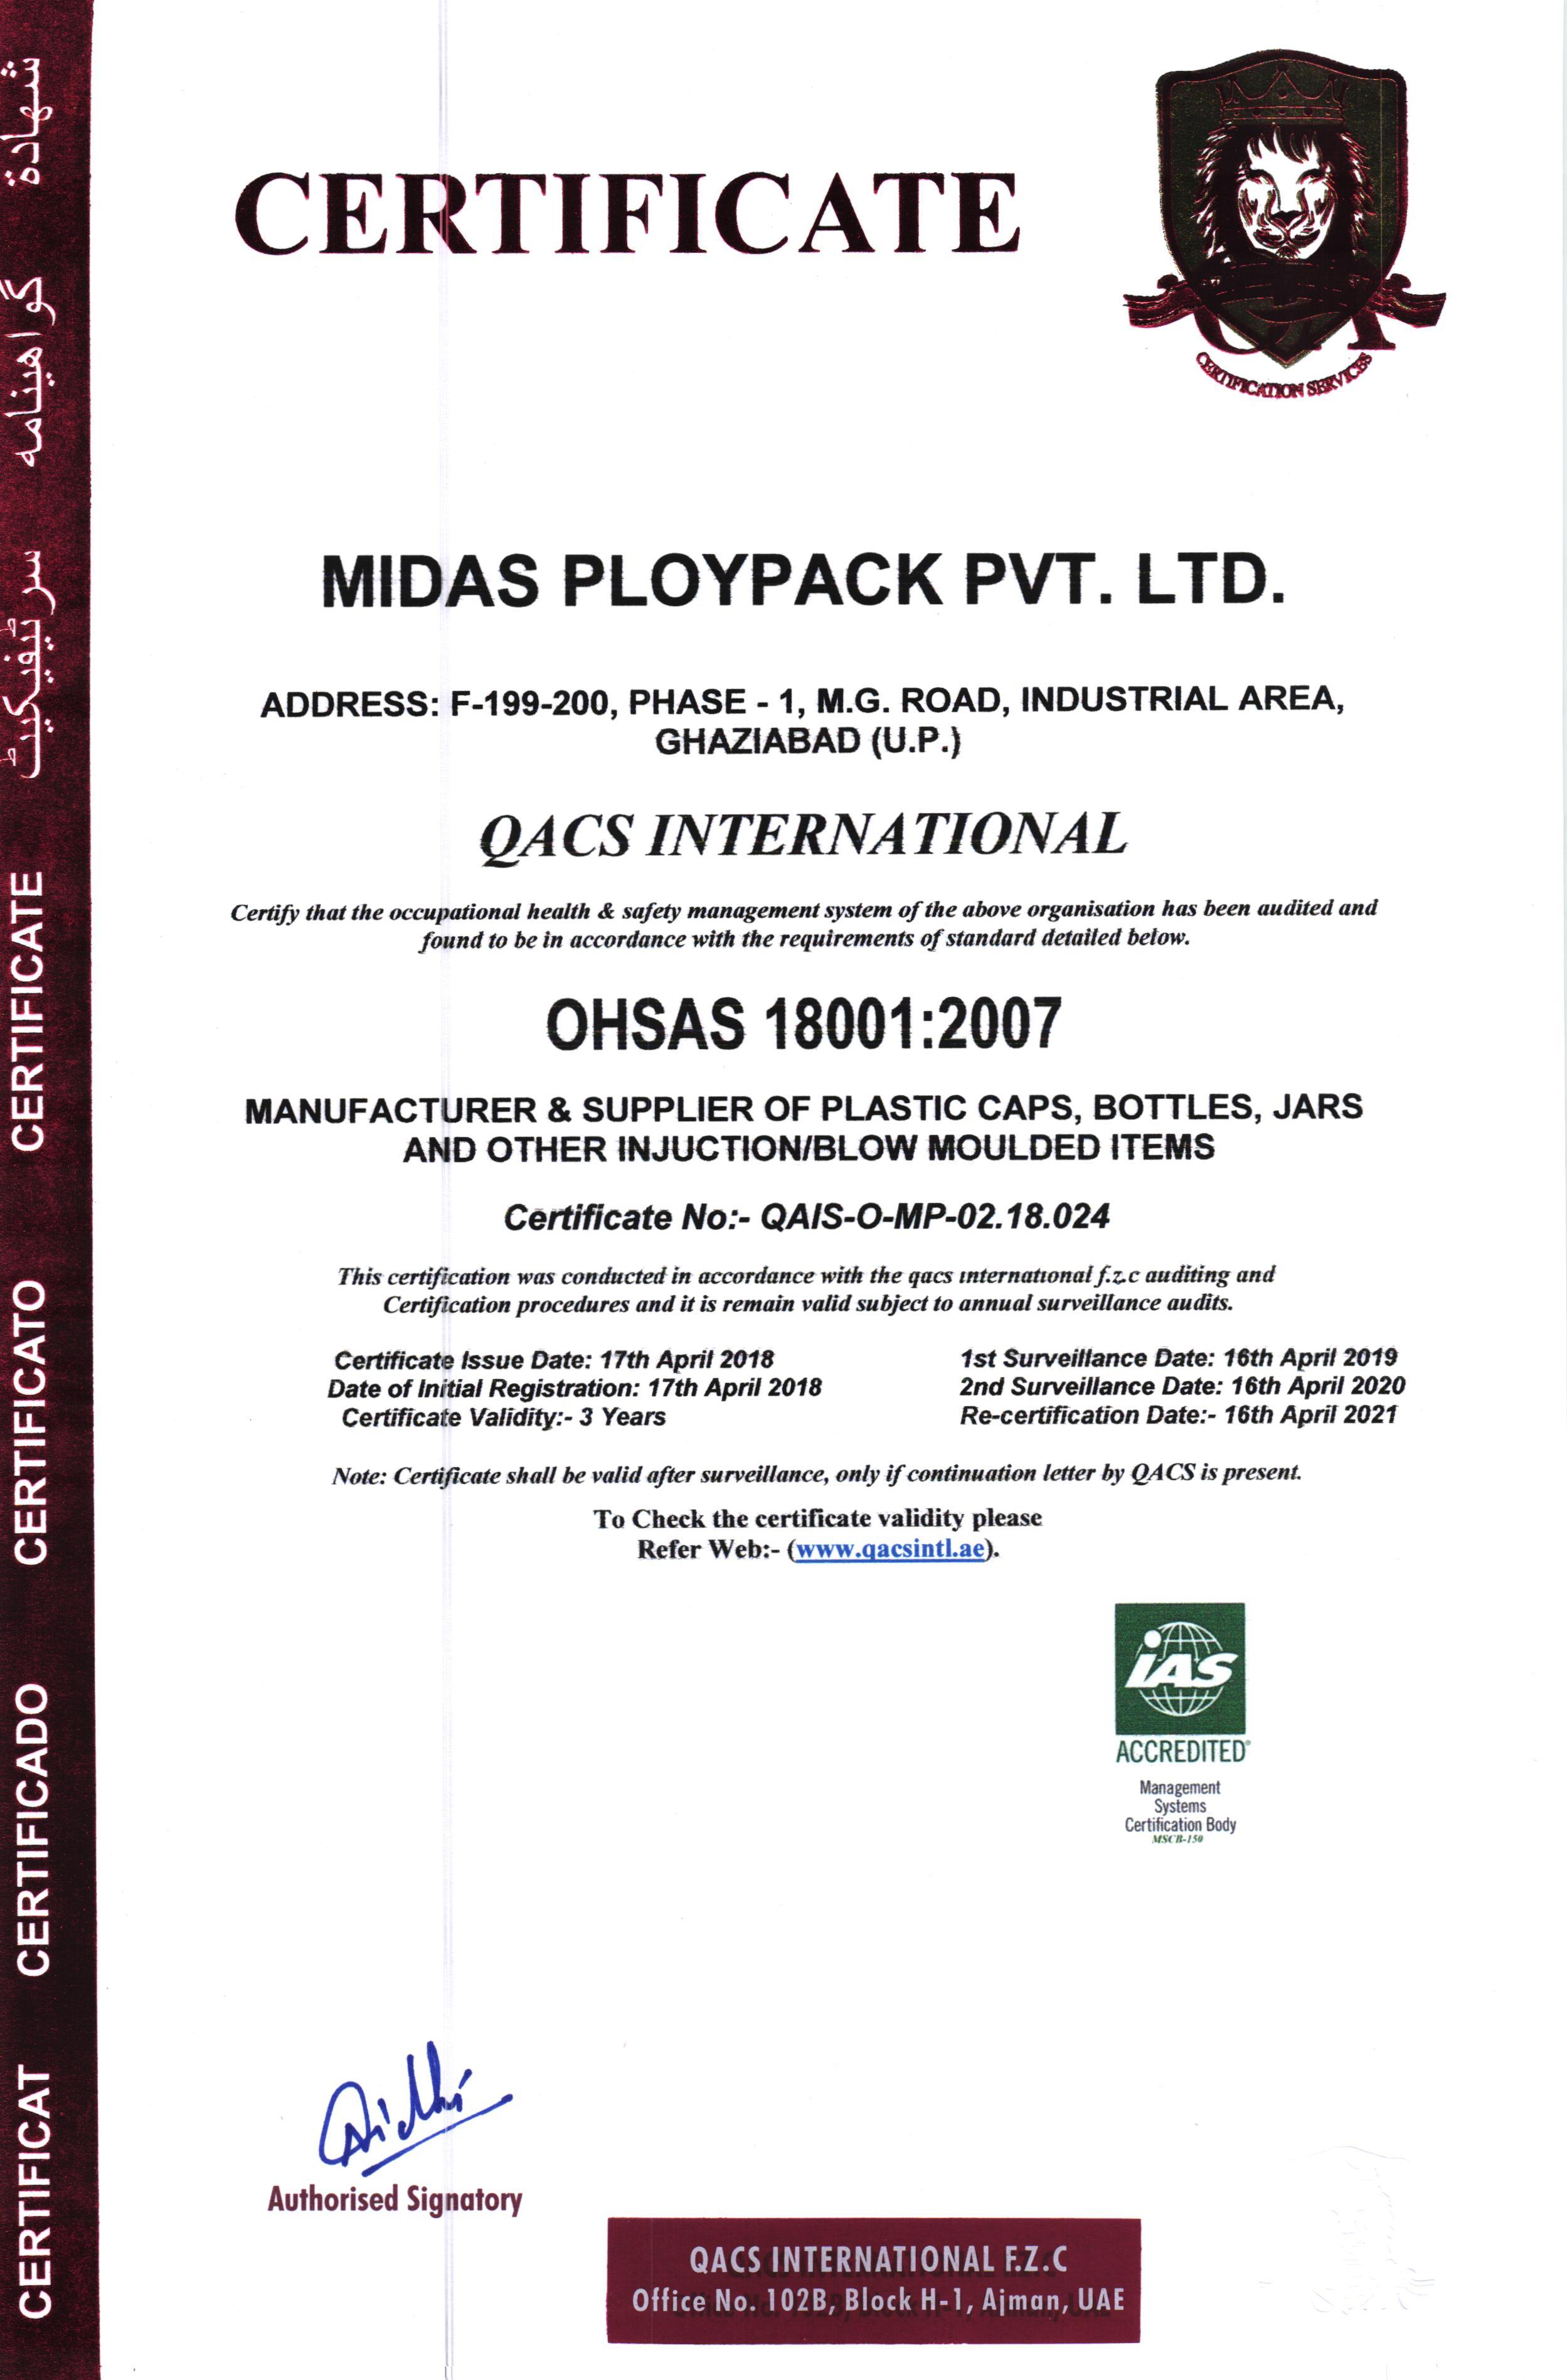 OHSAS 1800:2007 Certification